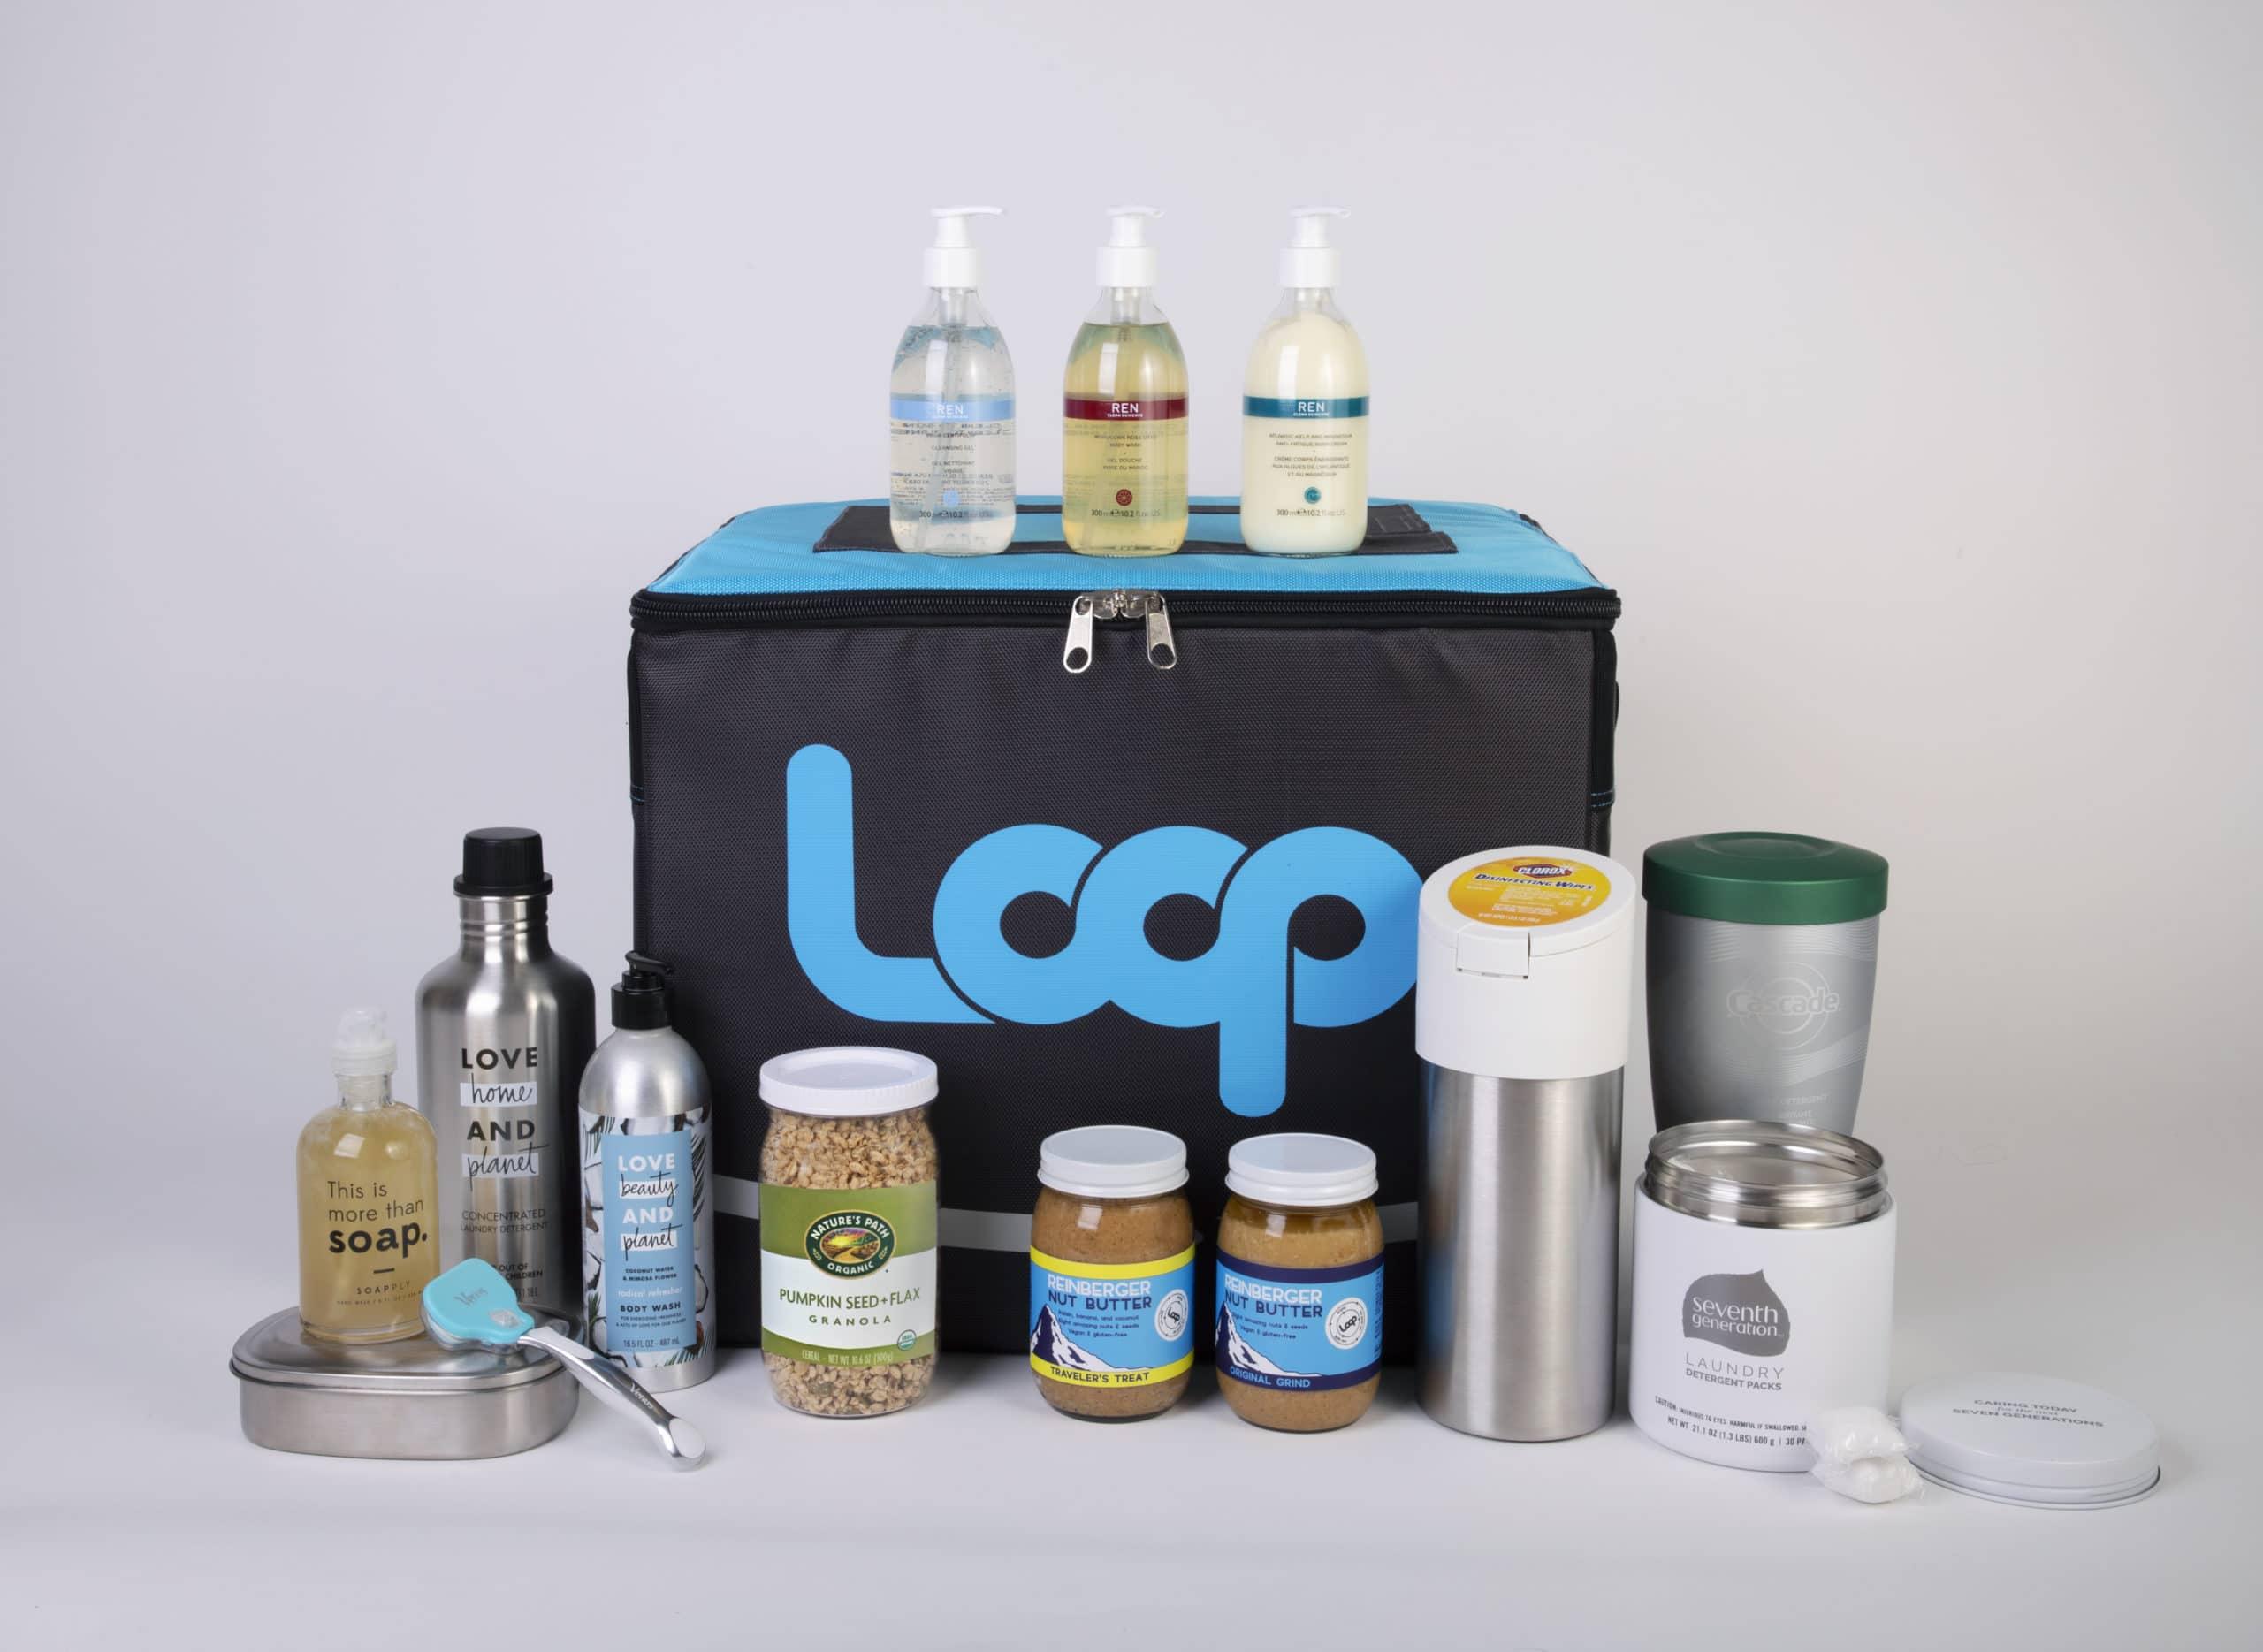 Loop Japan、東京都と連携して12月からリユース容器で弁当や惣菜を提供 ...